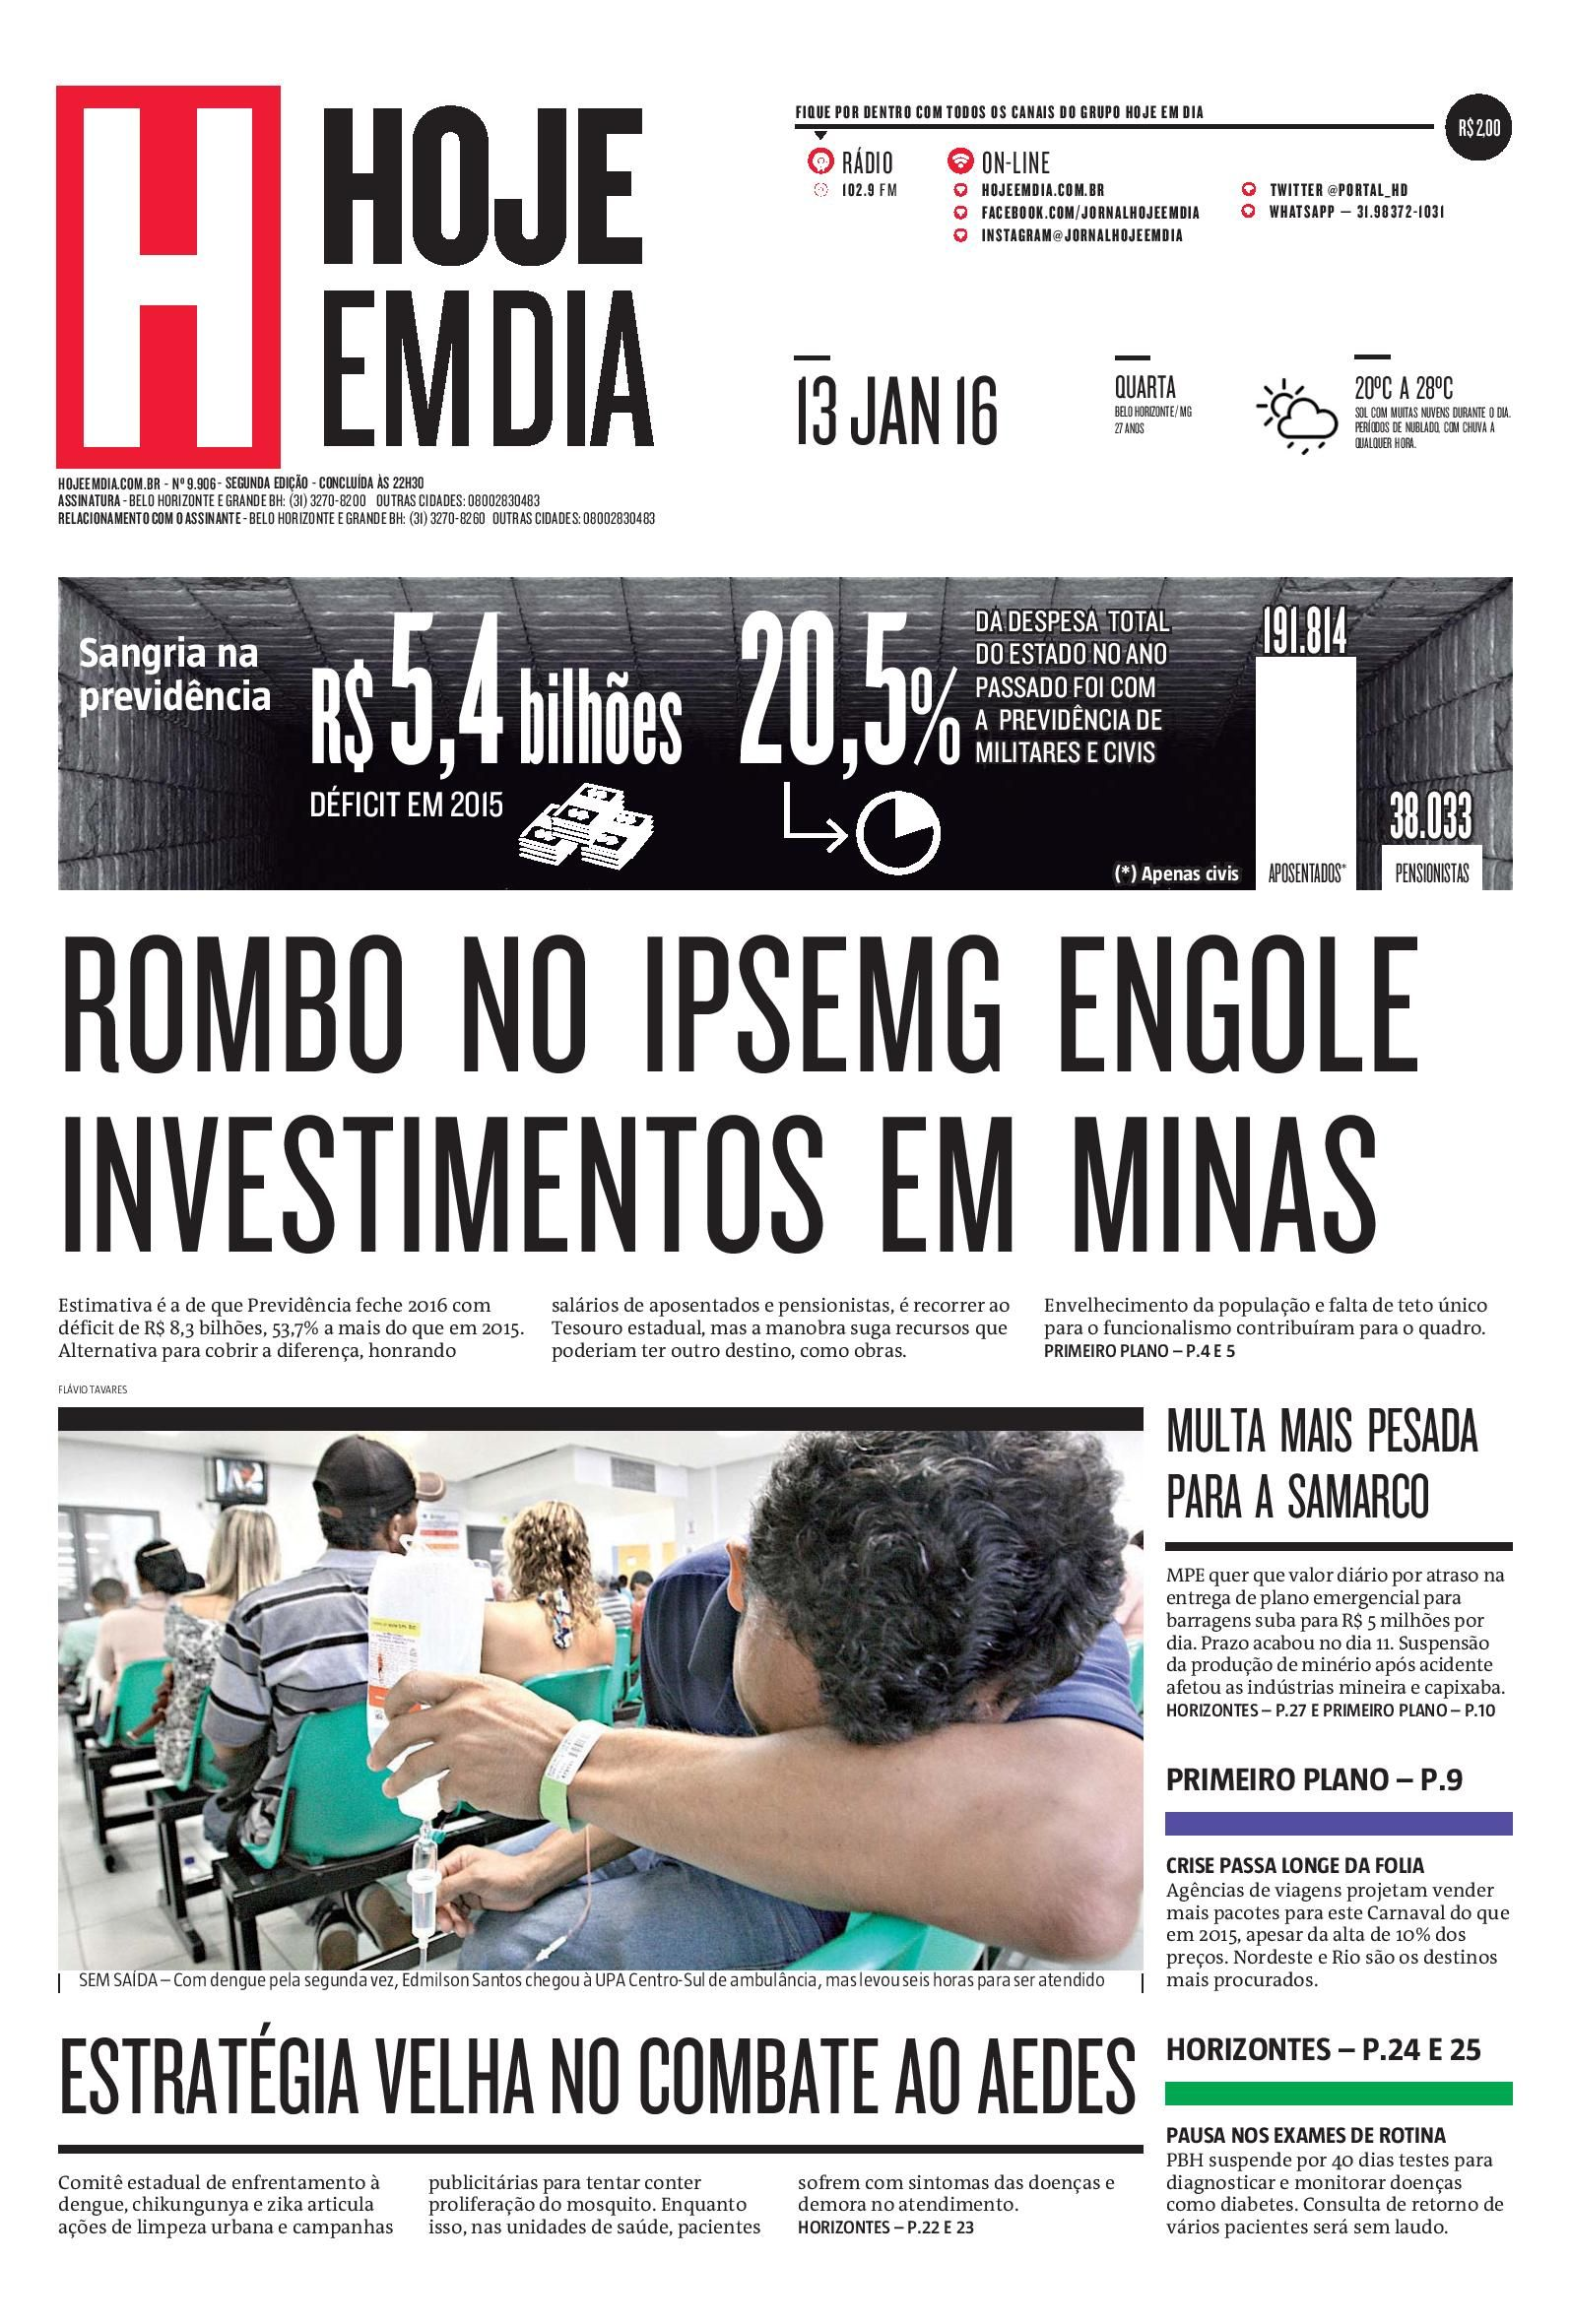 Capa do dia 13/01/2016 #HojeEmDia #Jornal #Notícias #News #Newspaper